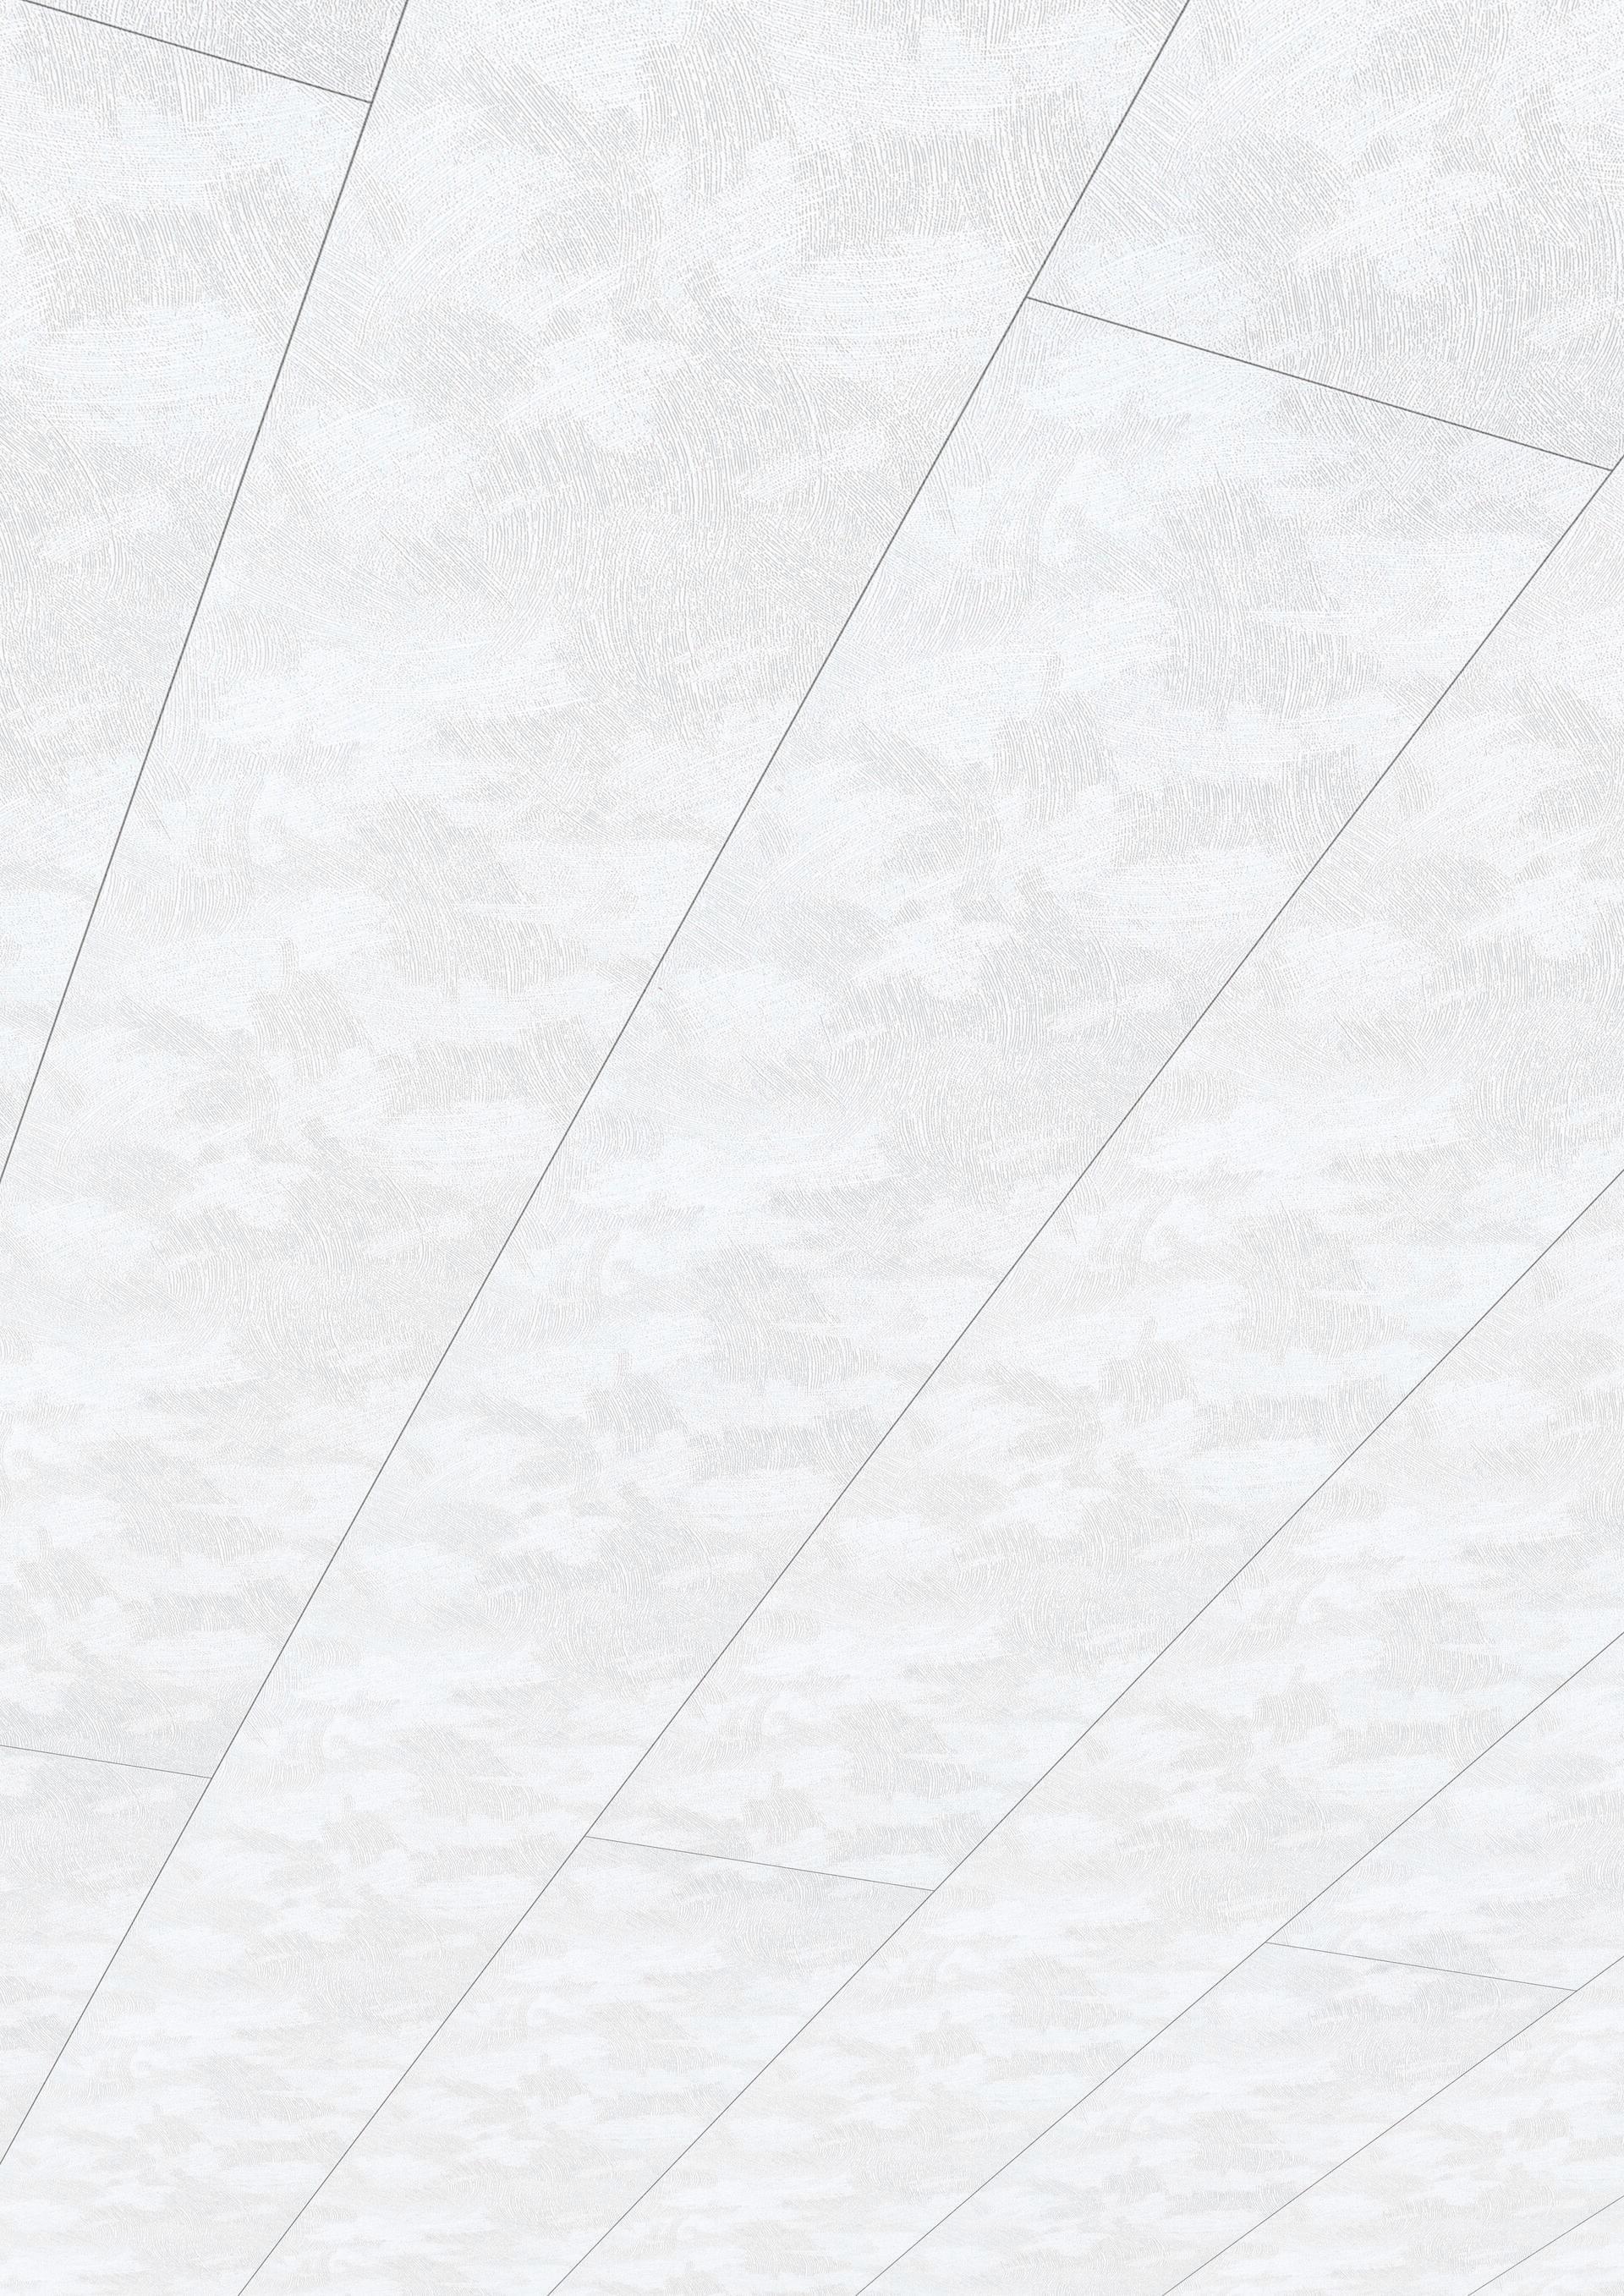 153_Terra_DP250_Perspektive.jpg